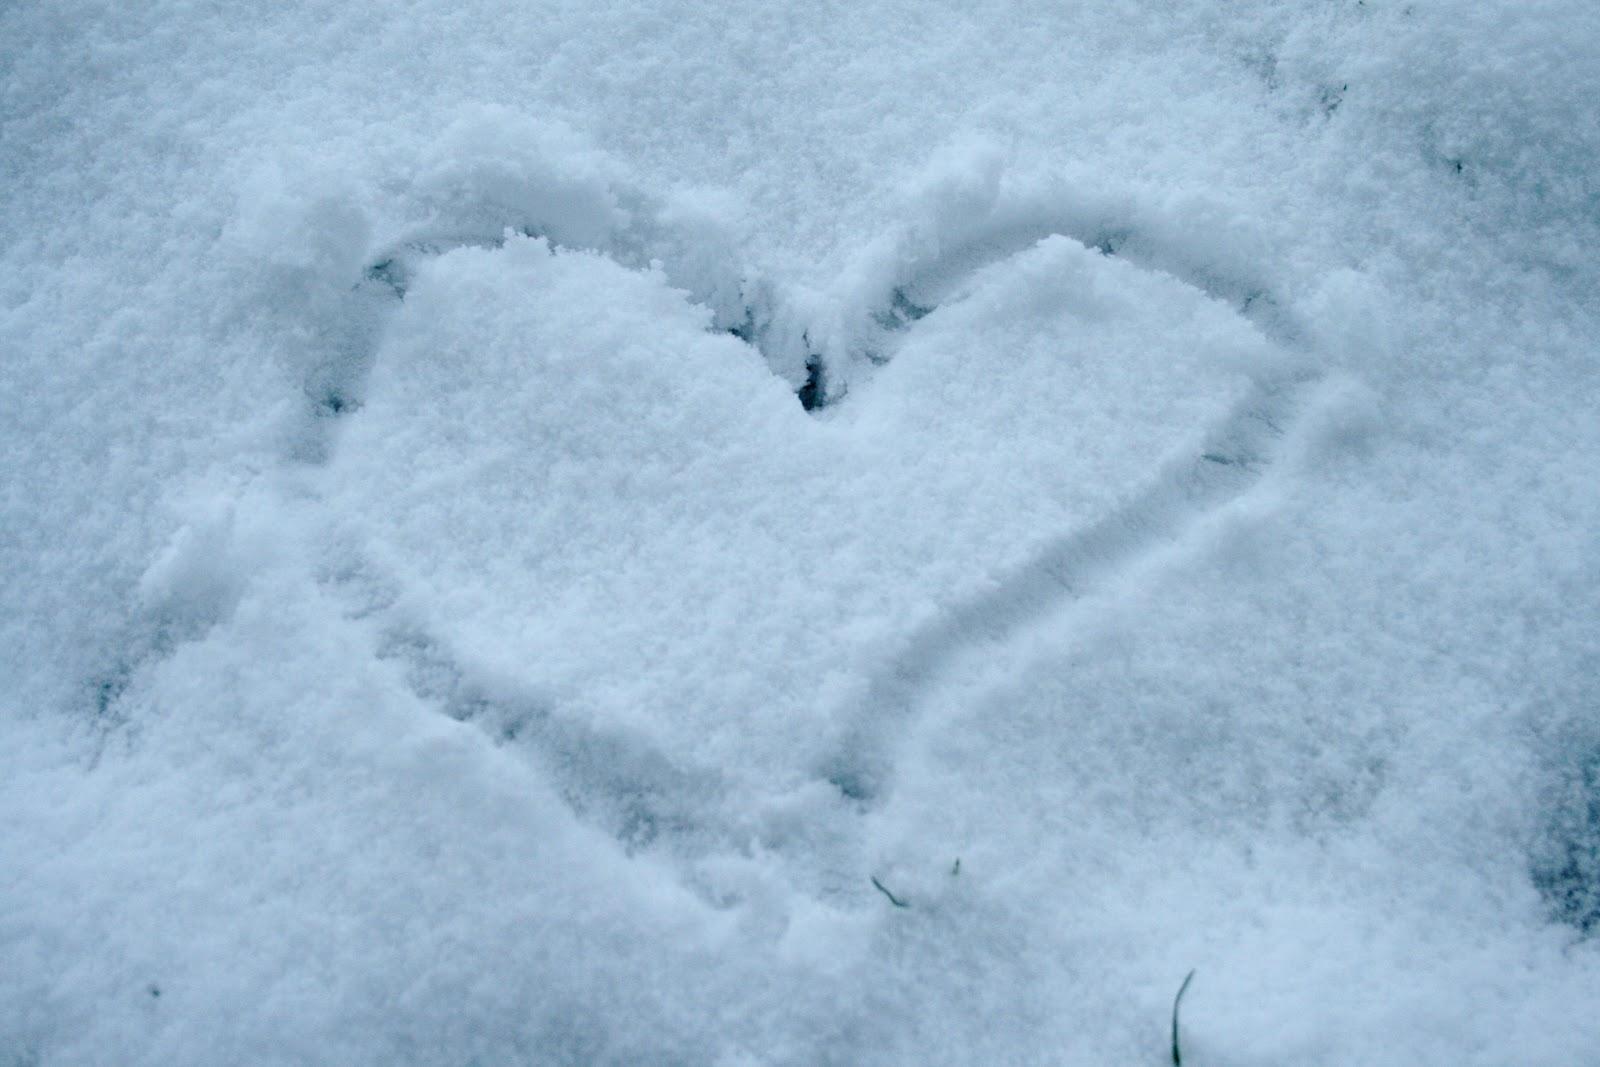 File:Heart of snow.JPG